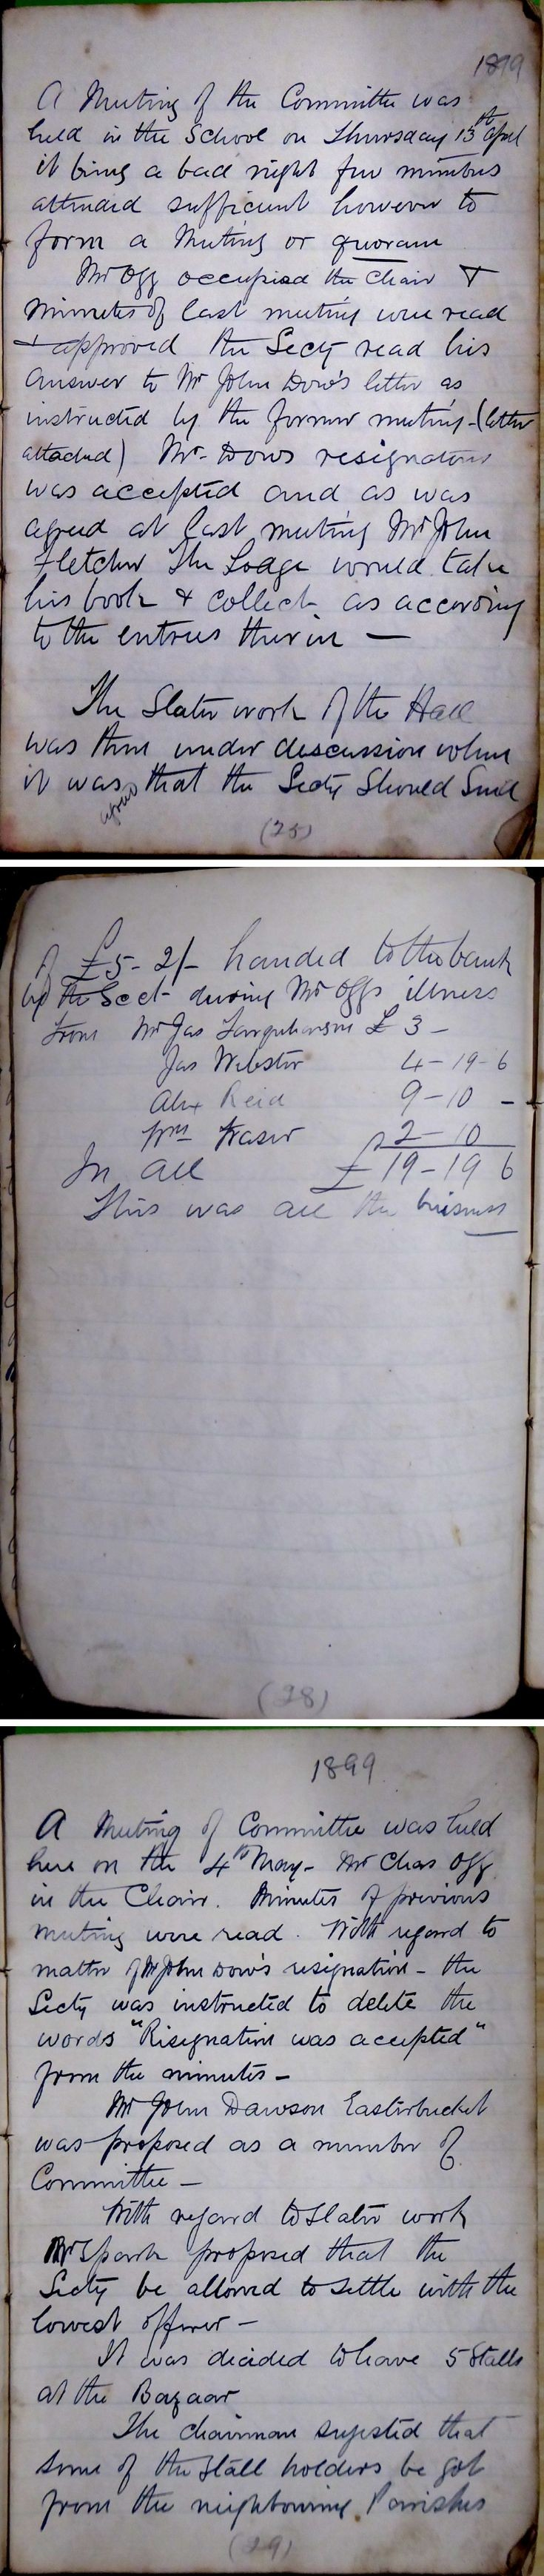 9 Glenbuchat Hall Committee Minutes